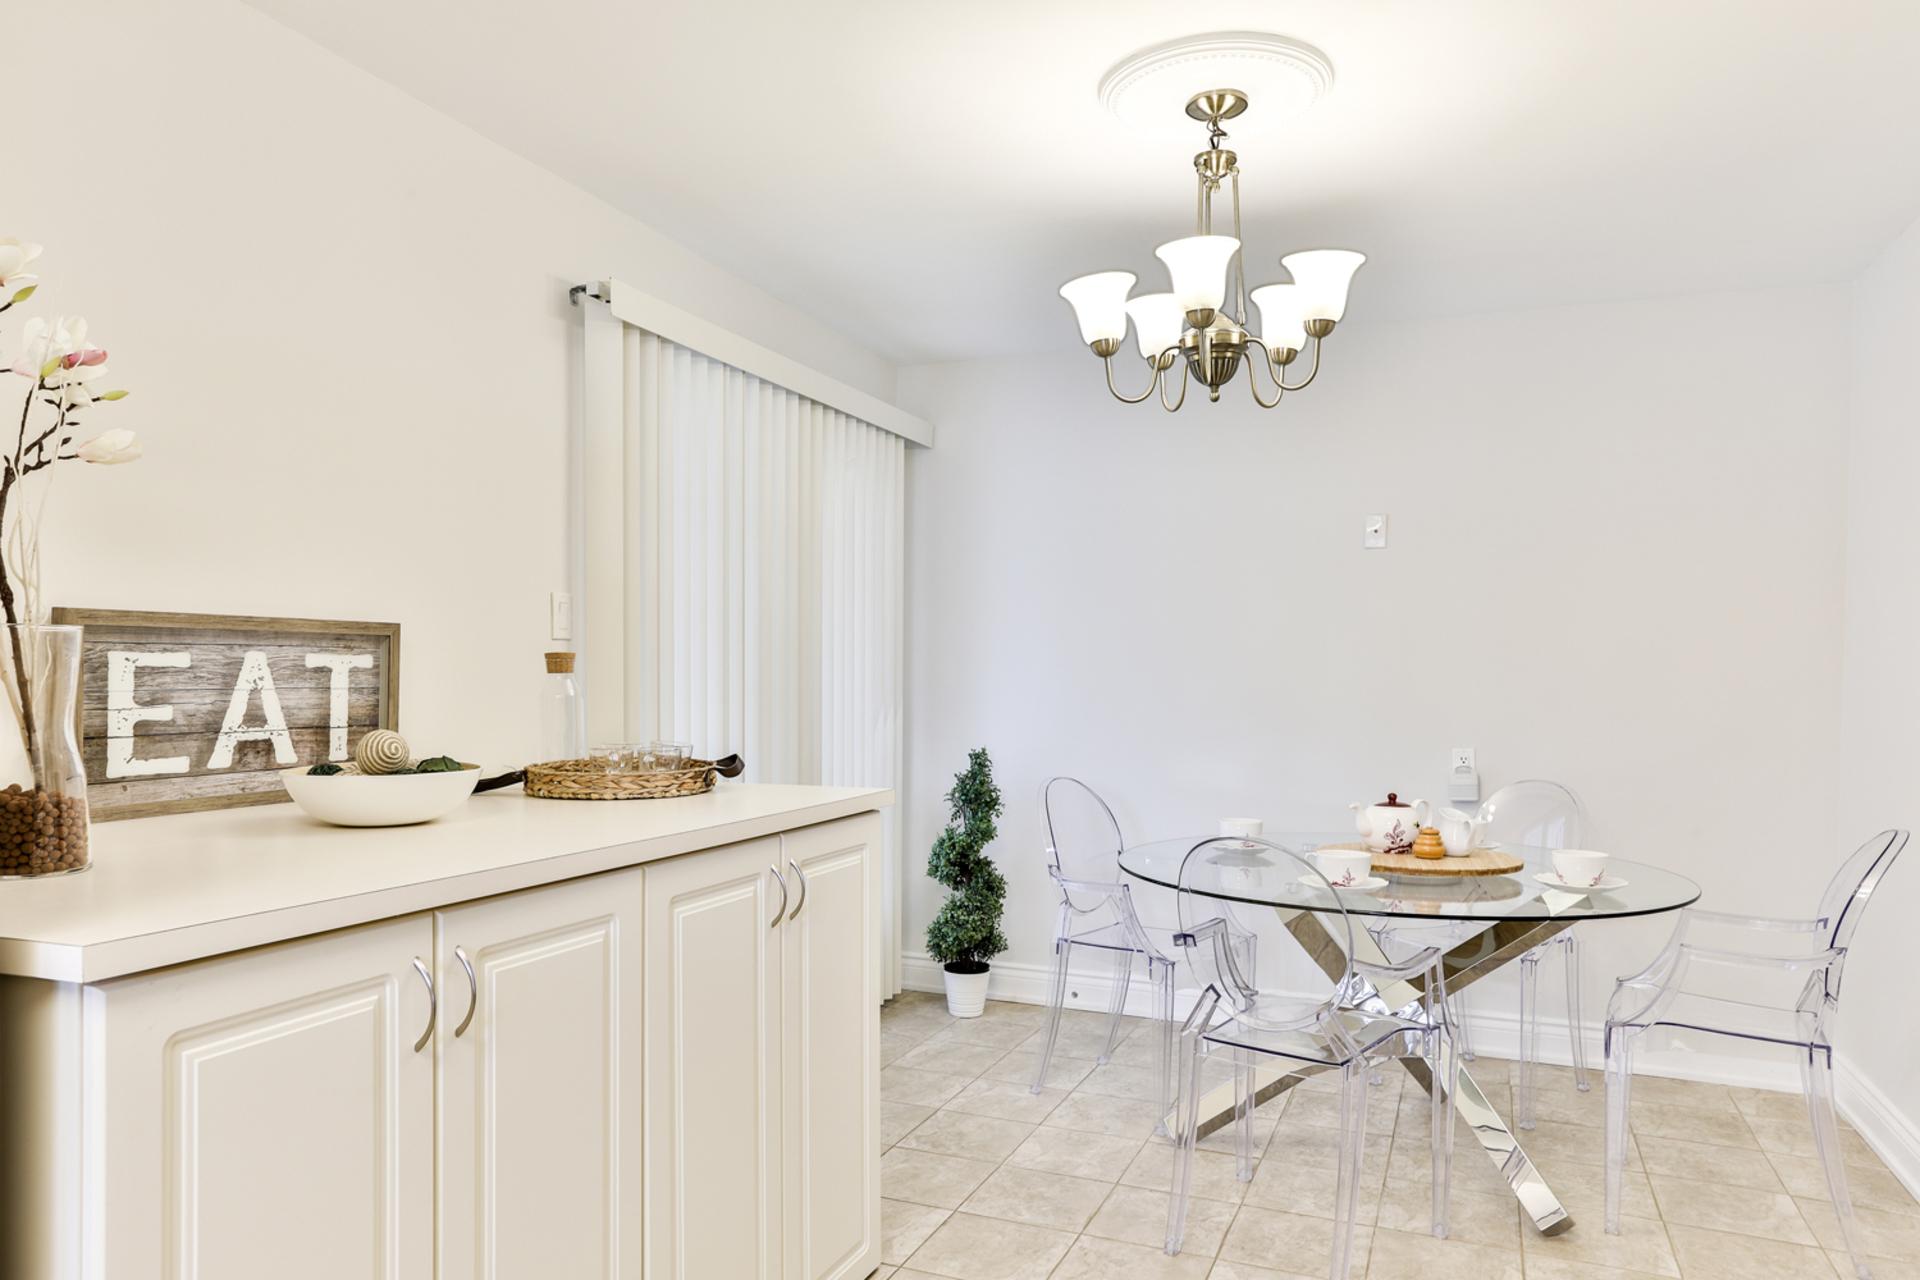 Kitchen at 111 Bannatyne Drive, St. Andrew-Windfields, Toronto